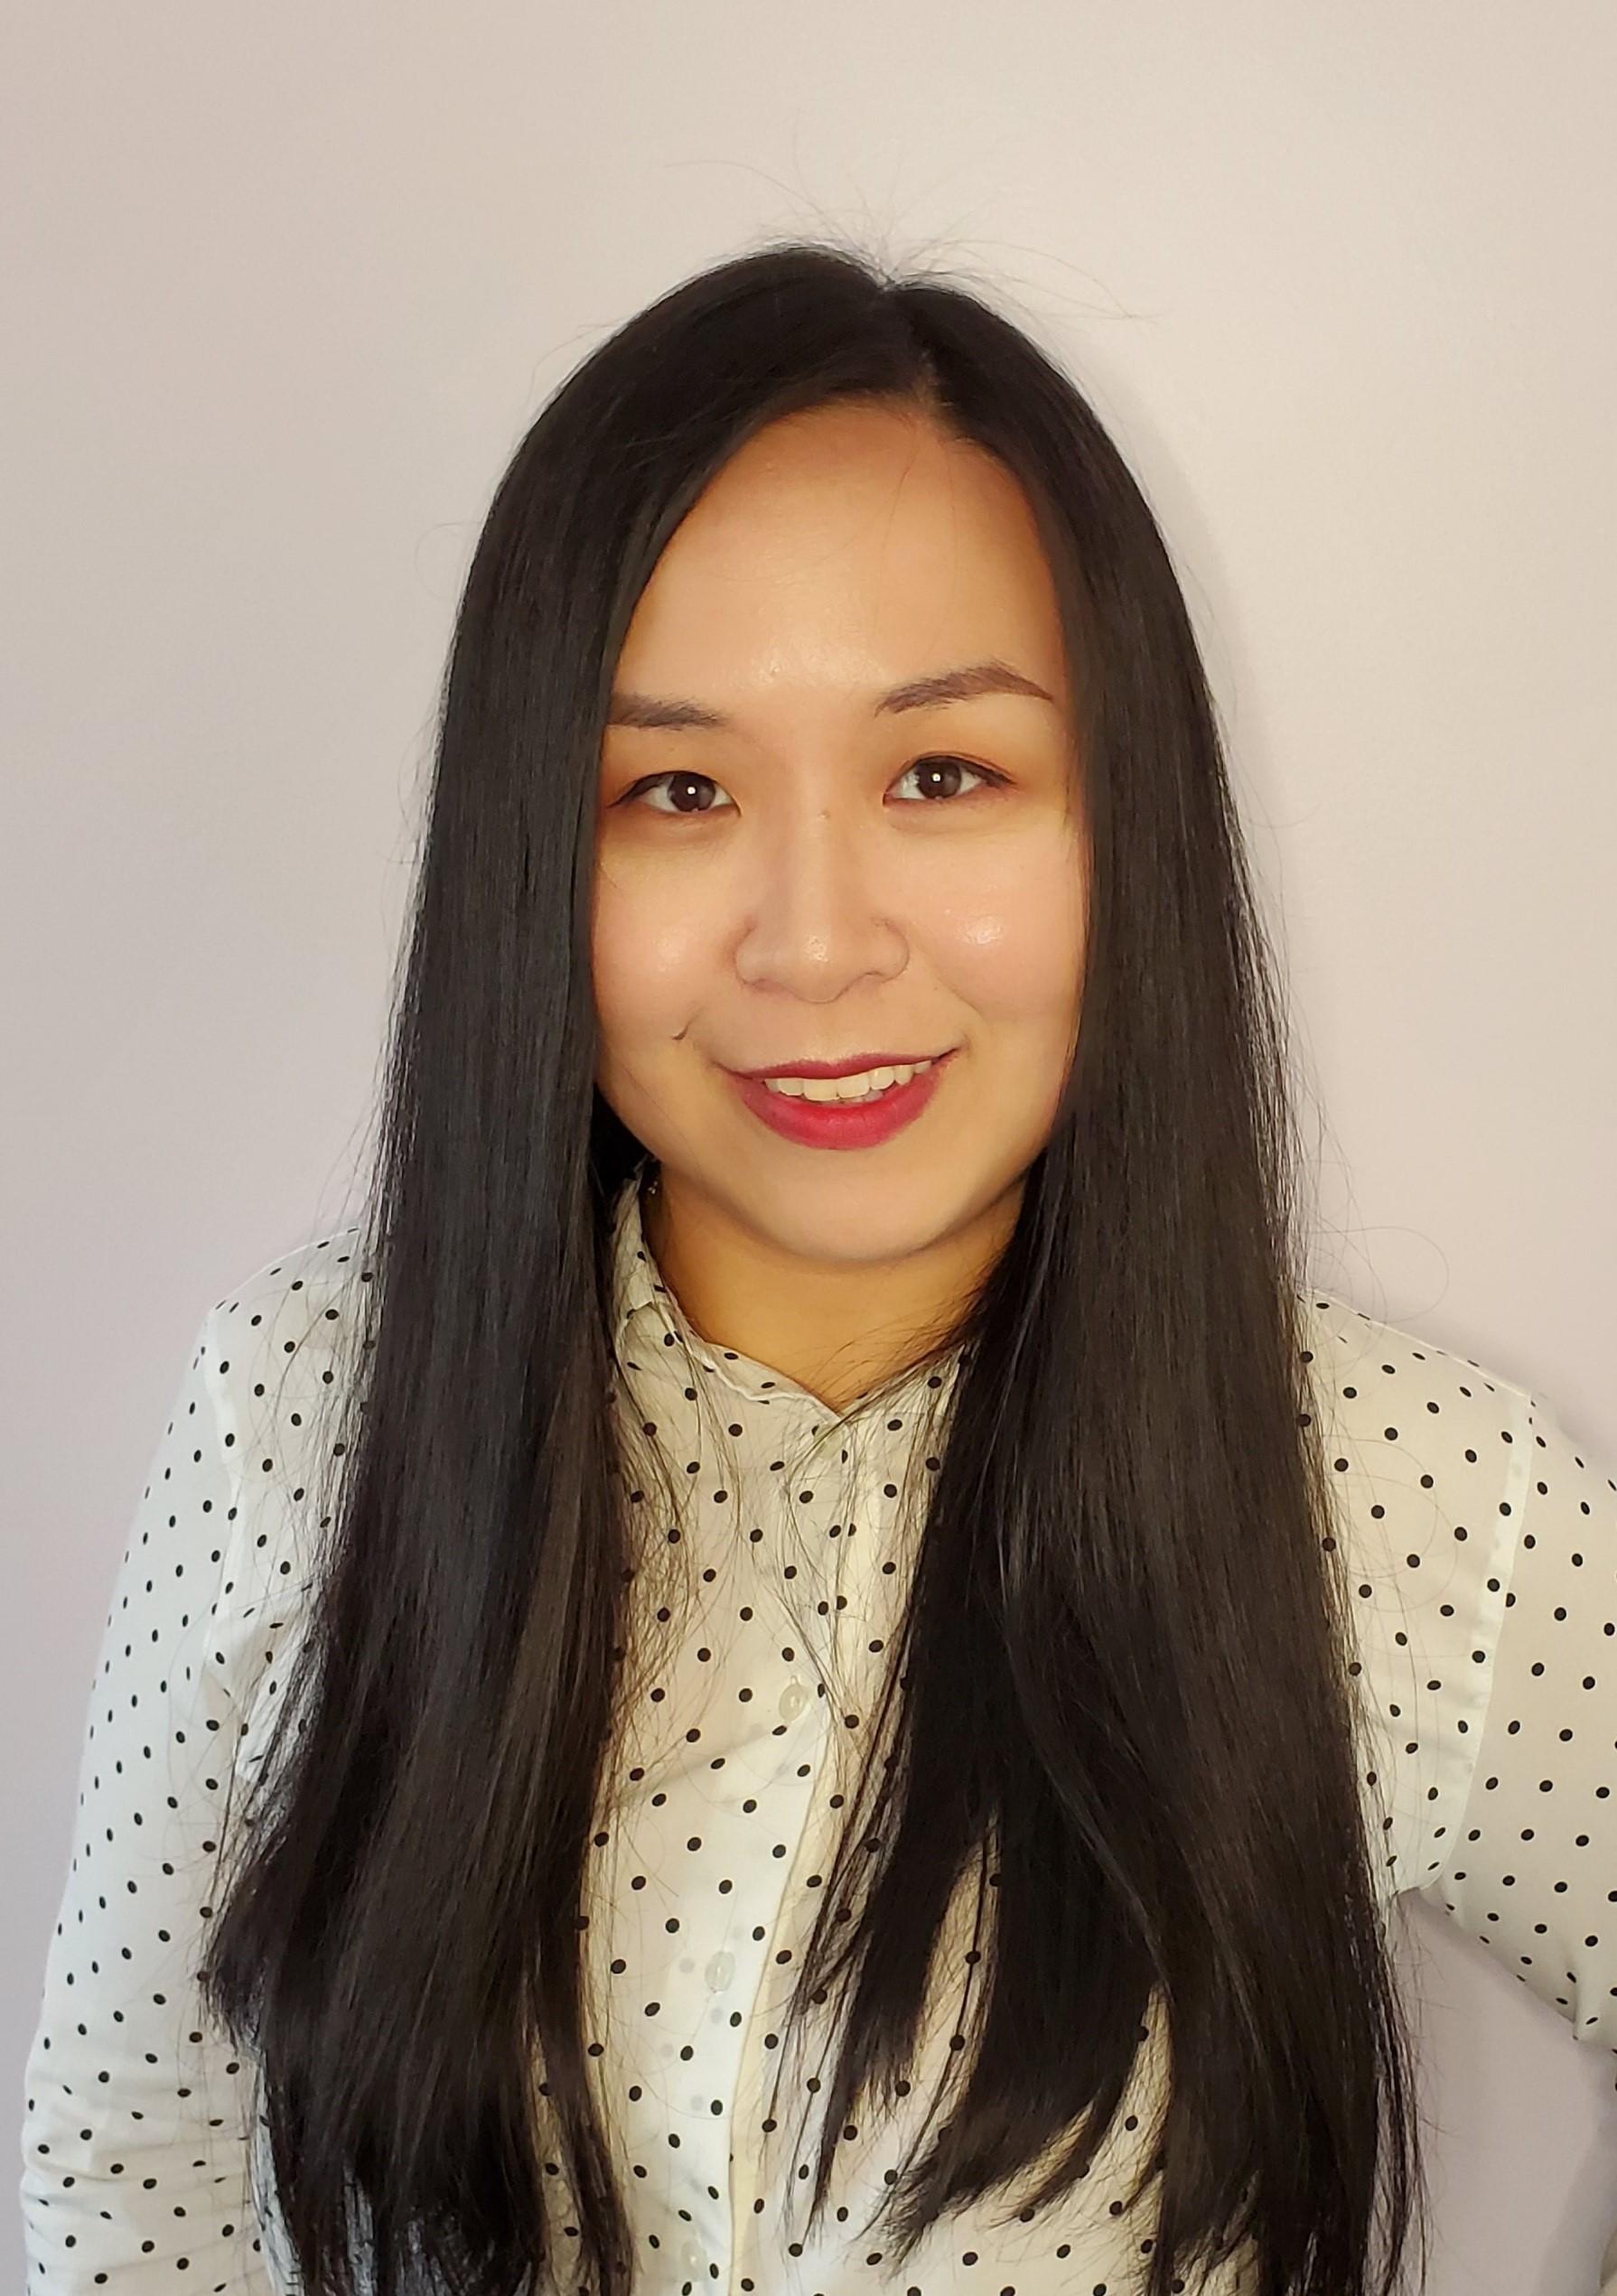 Sophie Guan - Food Service Manager - Surrey Campus